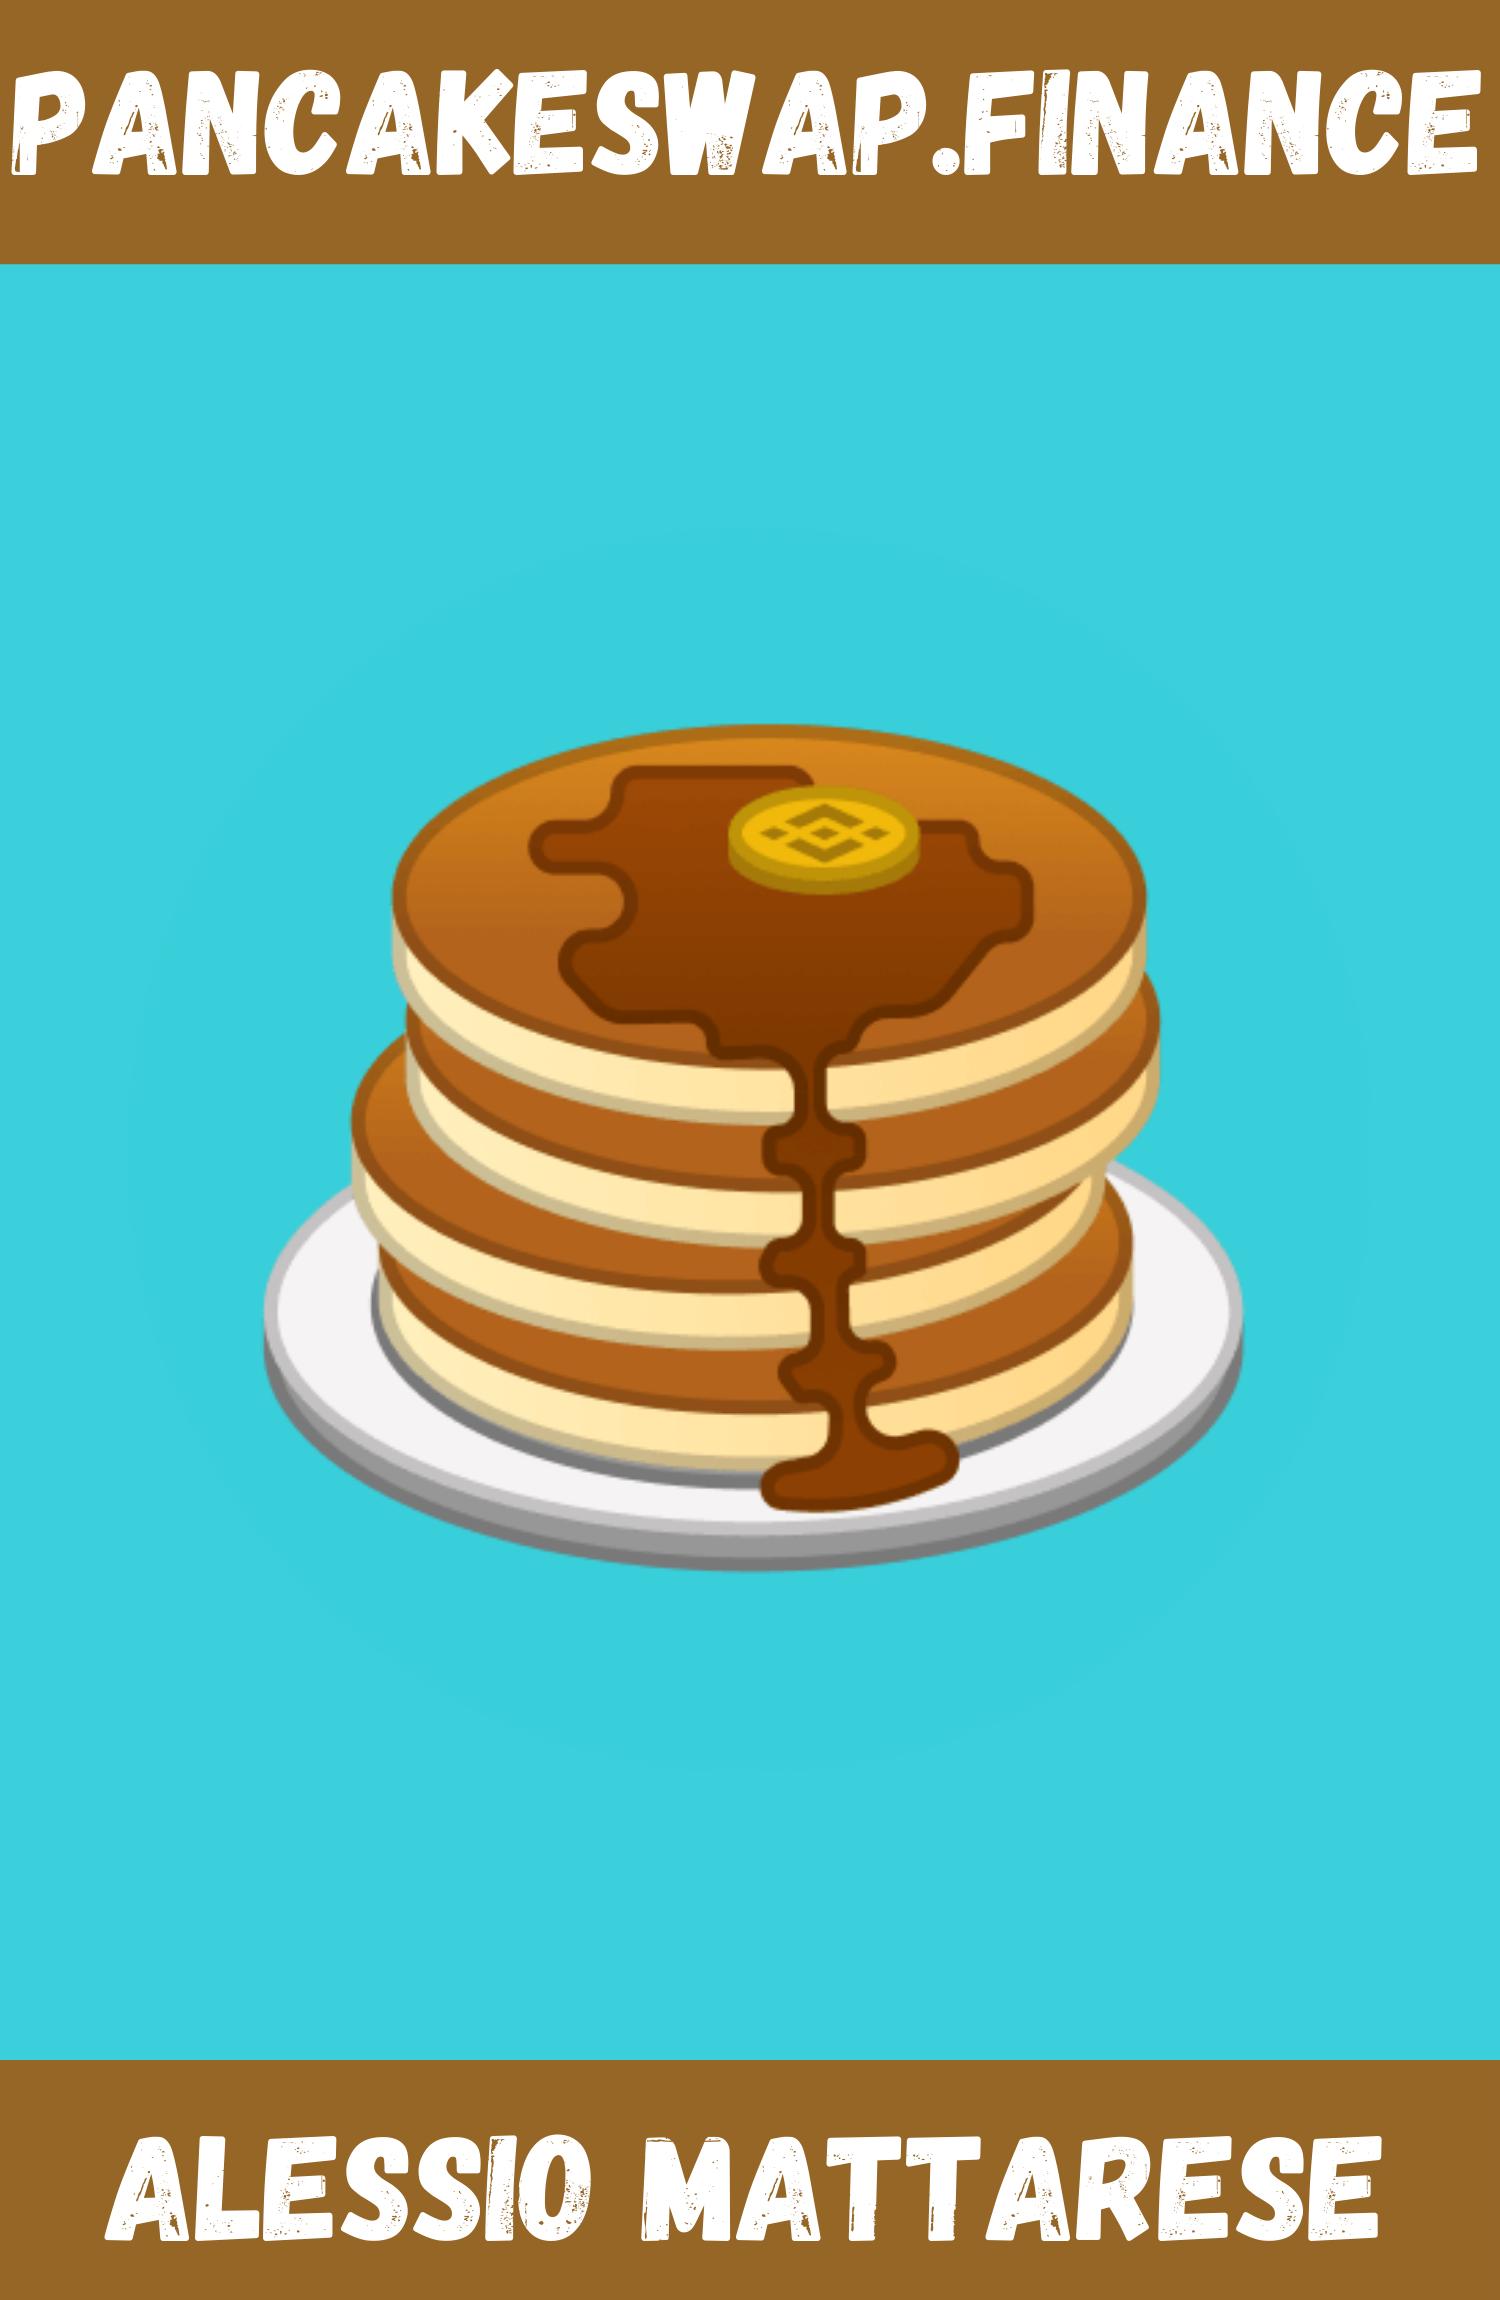 Pancakeswpa.finance